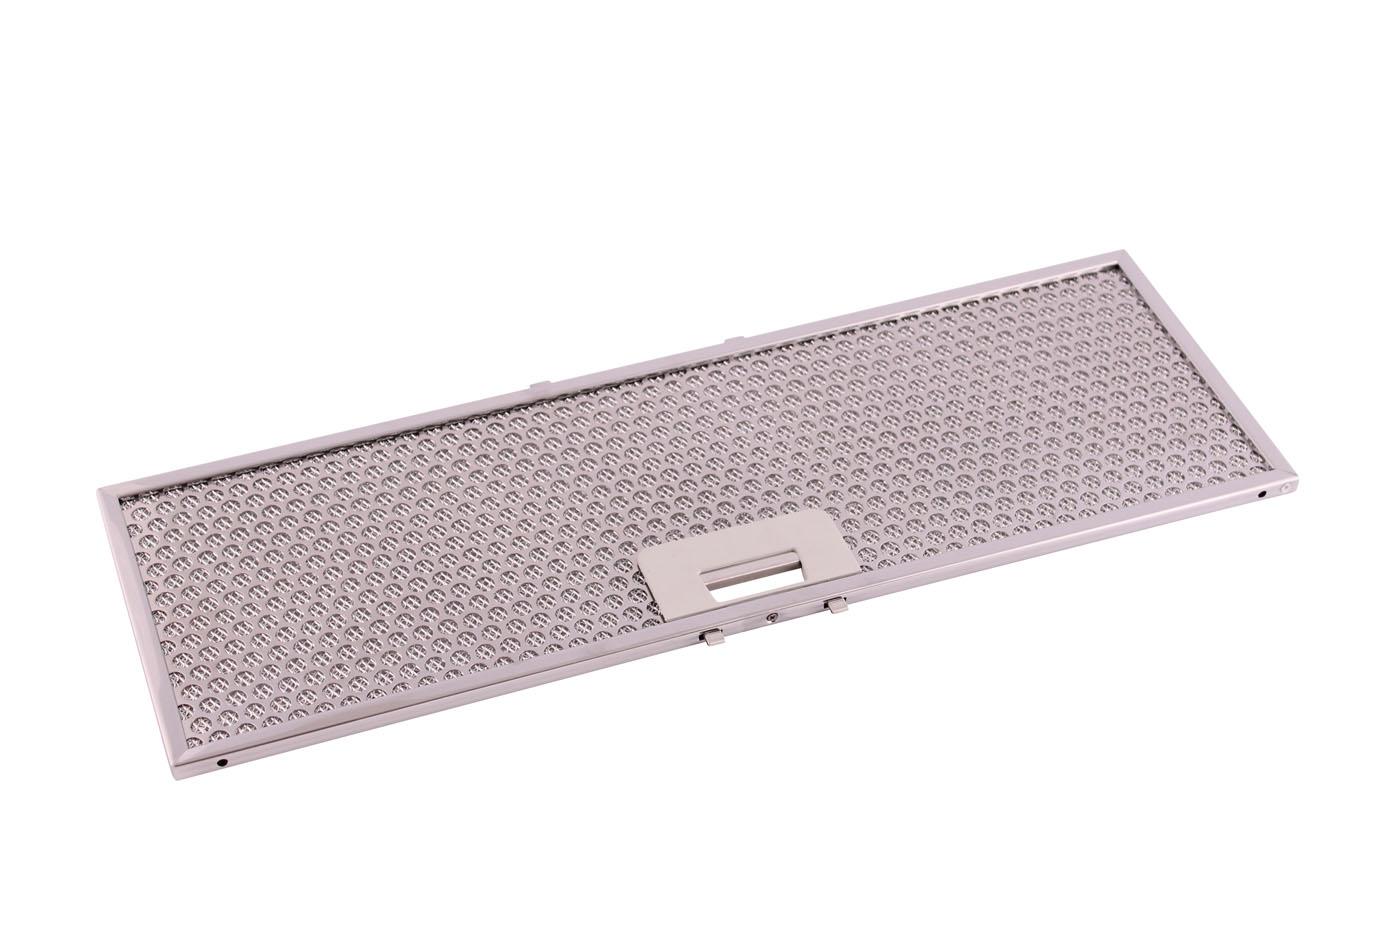 Novy aluminium filter 475 x 160 mm voor afzuigkap 508-90085